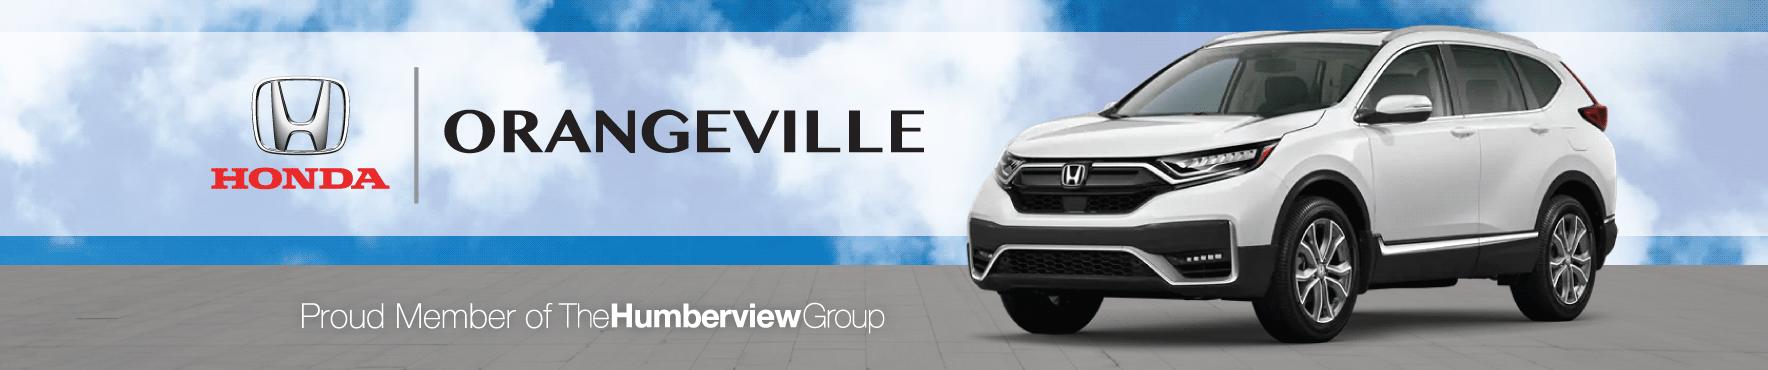 Orangeville Honda - About Us